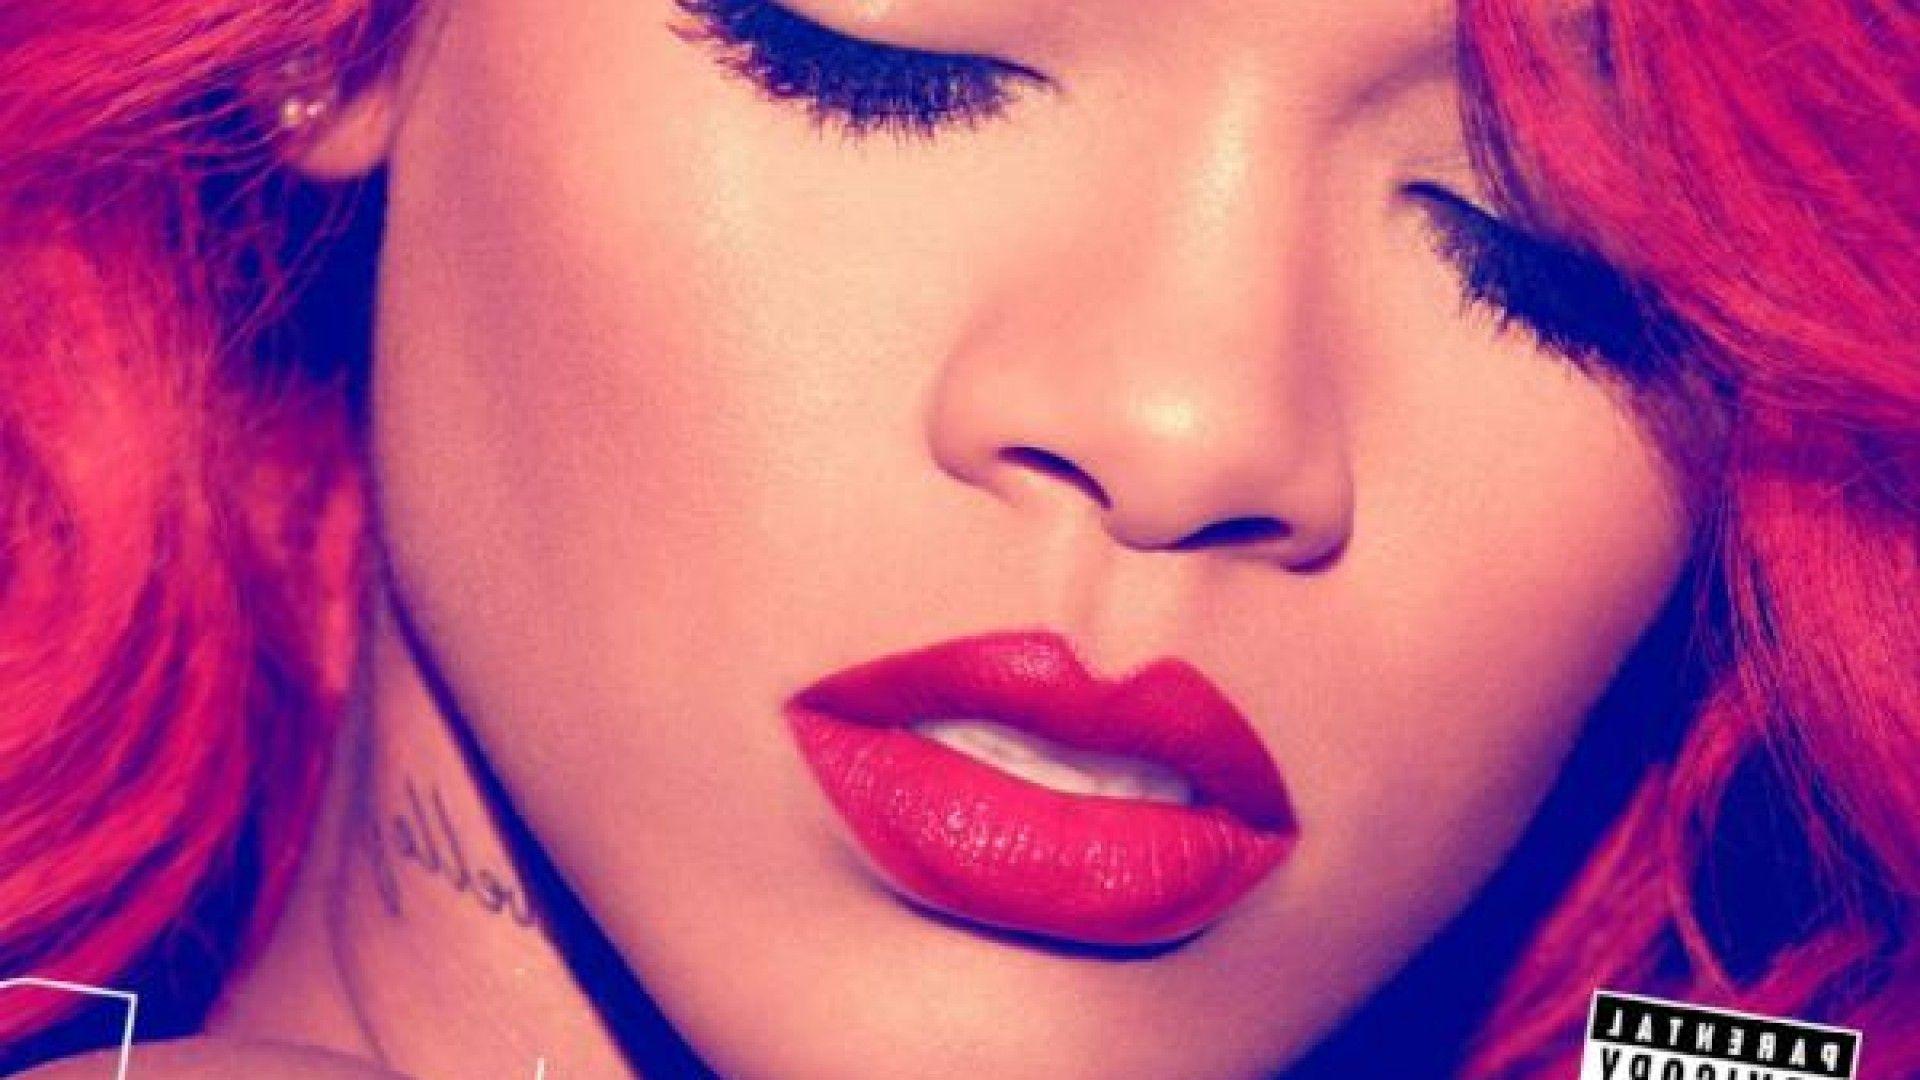 Free Rihanna Wallpapers - Wallpaper Cave